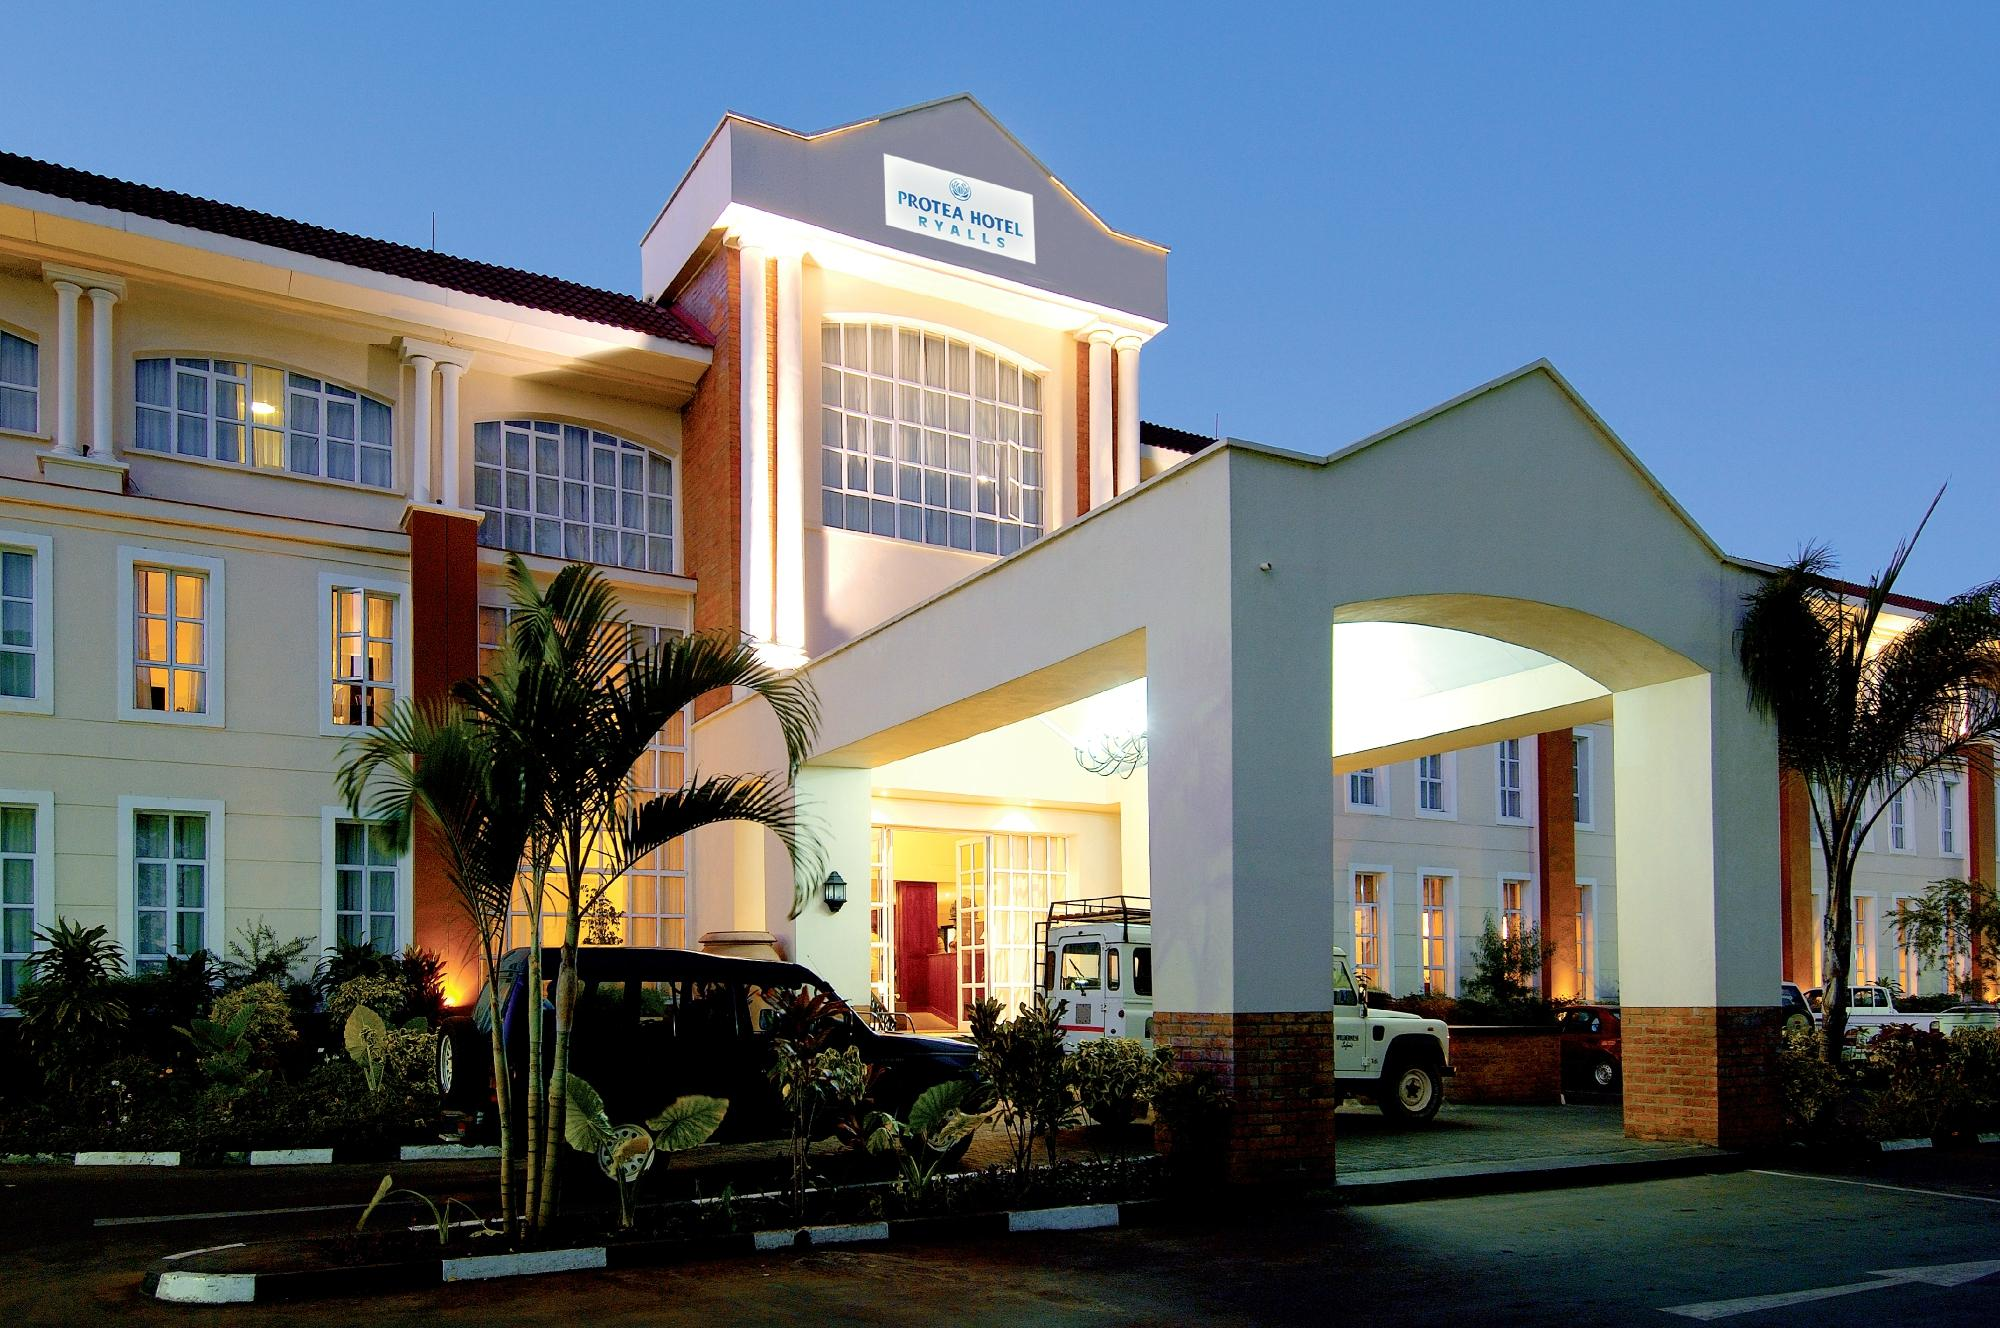 Protea Hotel Blantyre Ryalls, Blantyre City